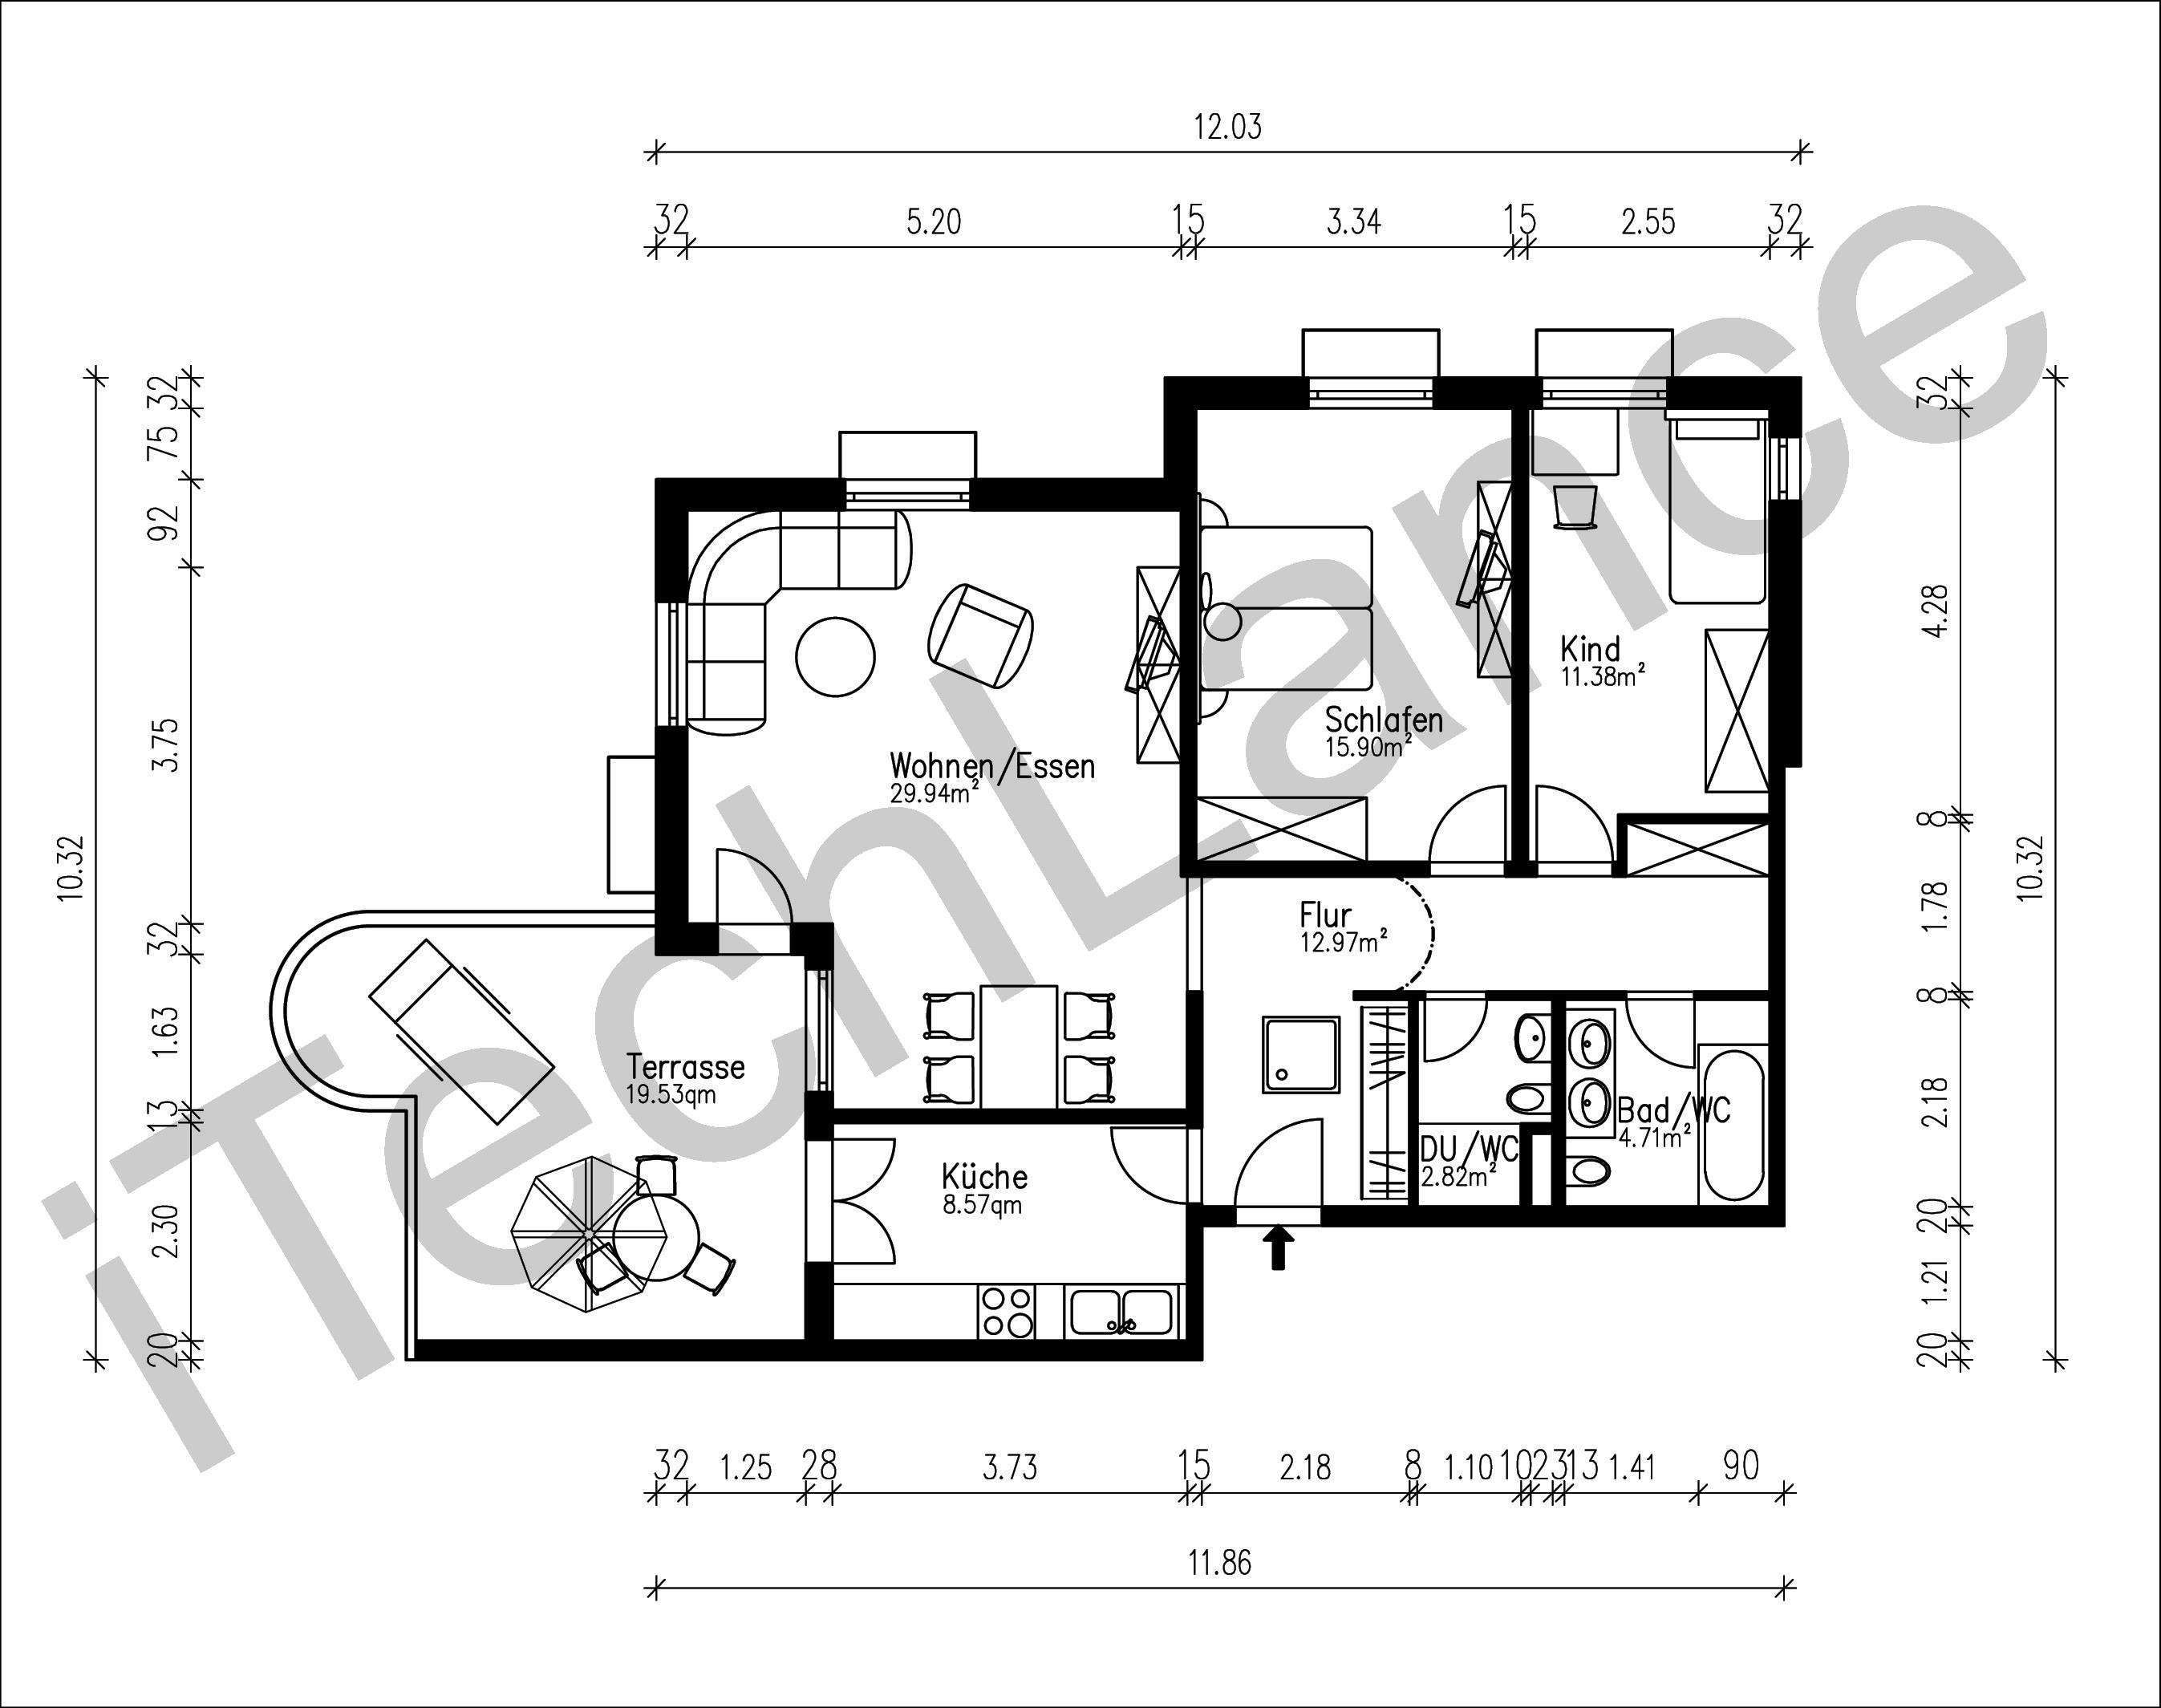 GIS company | CAD company | GIS Companies | CAD Companies | CAD, GIS ...